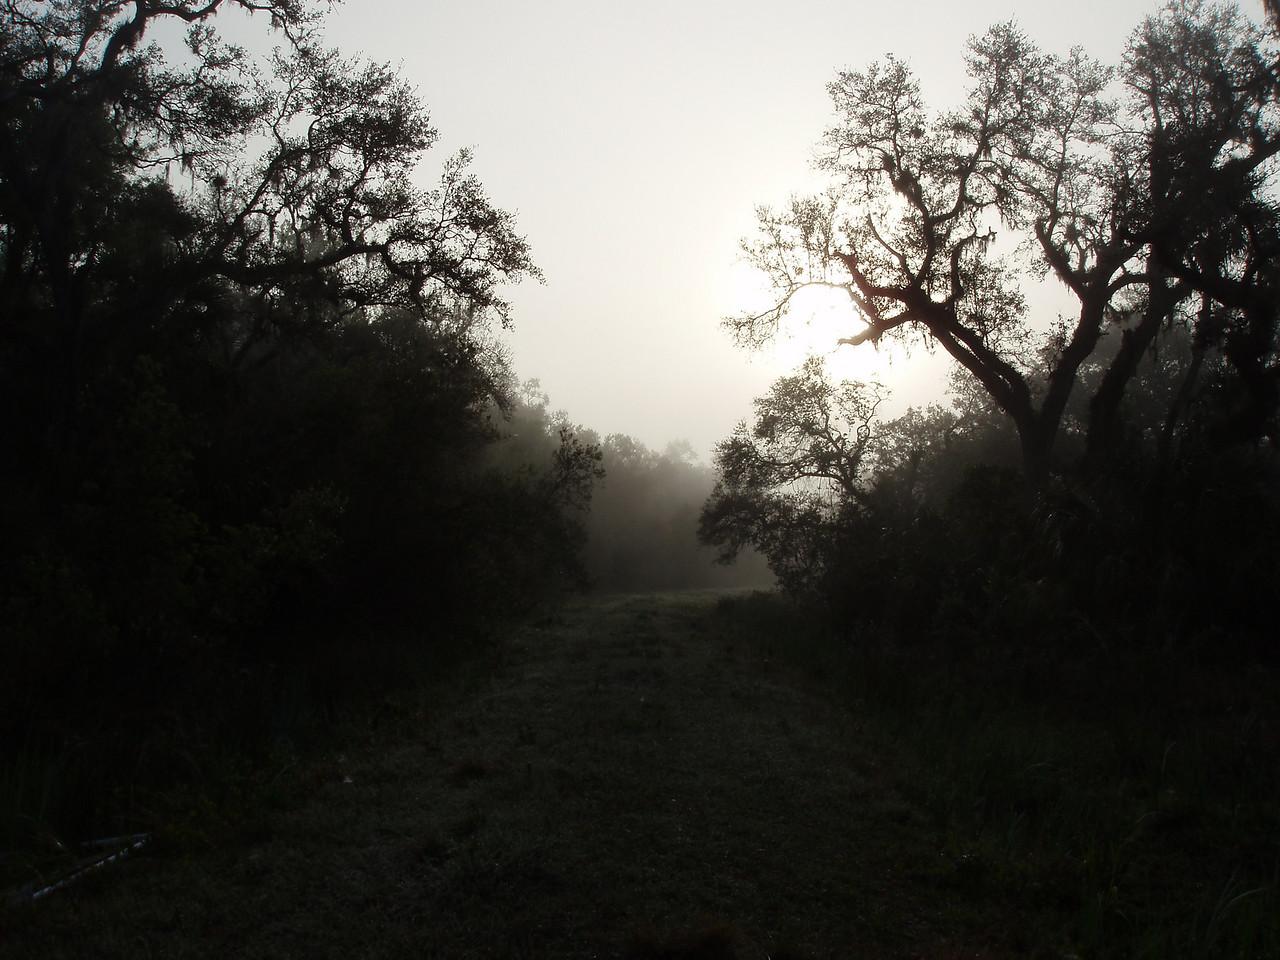 Walking the trail at daybreak<br /> PHOTO CREDIT: Robert Coveney / Florida Trail Association